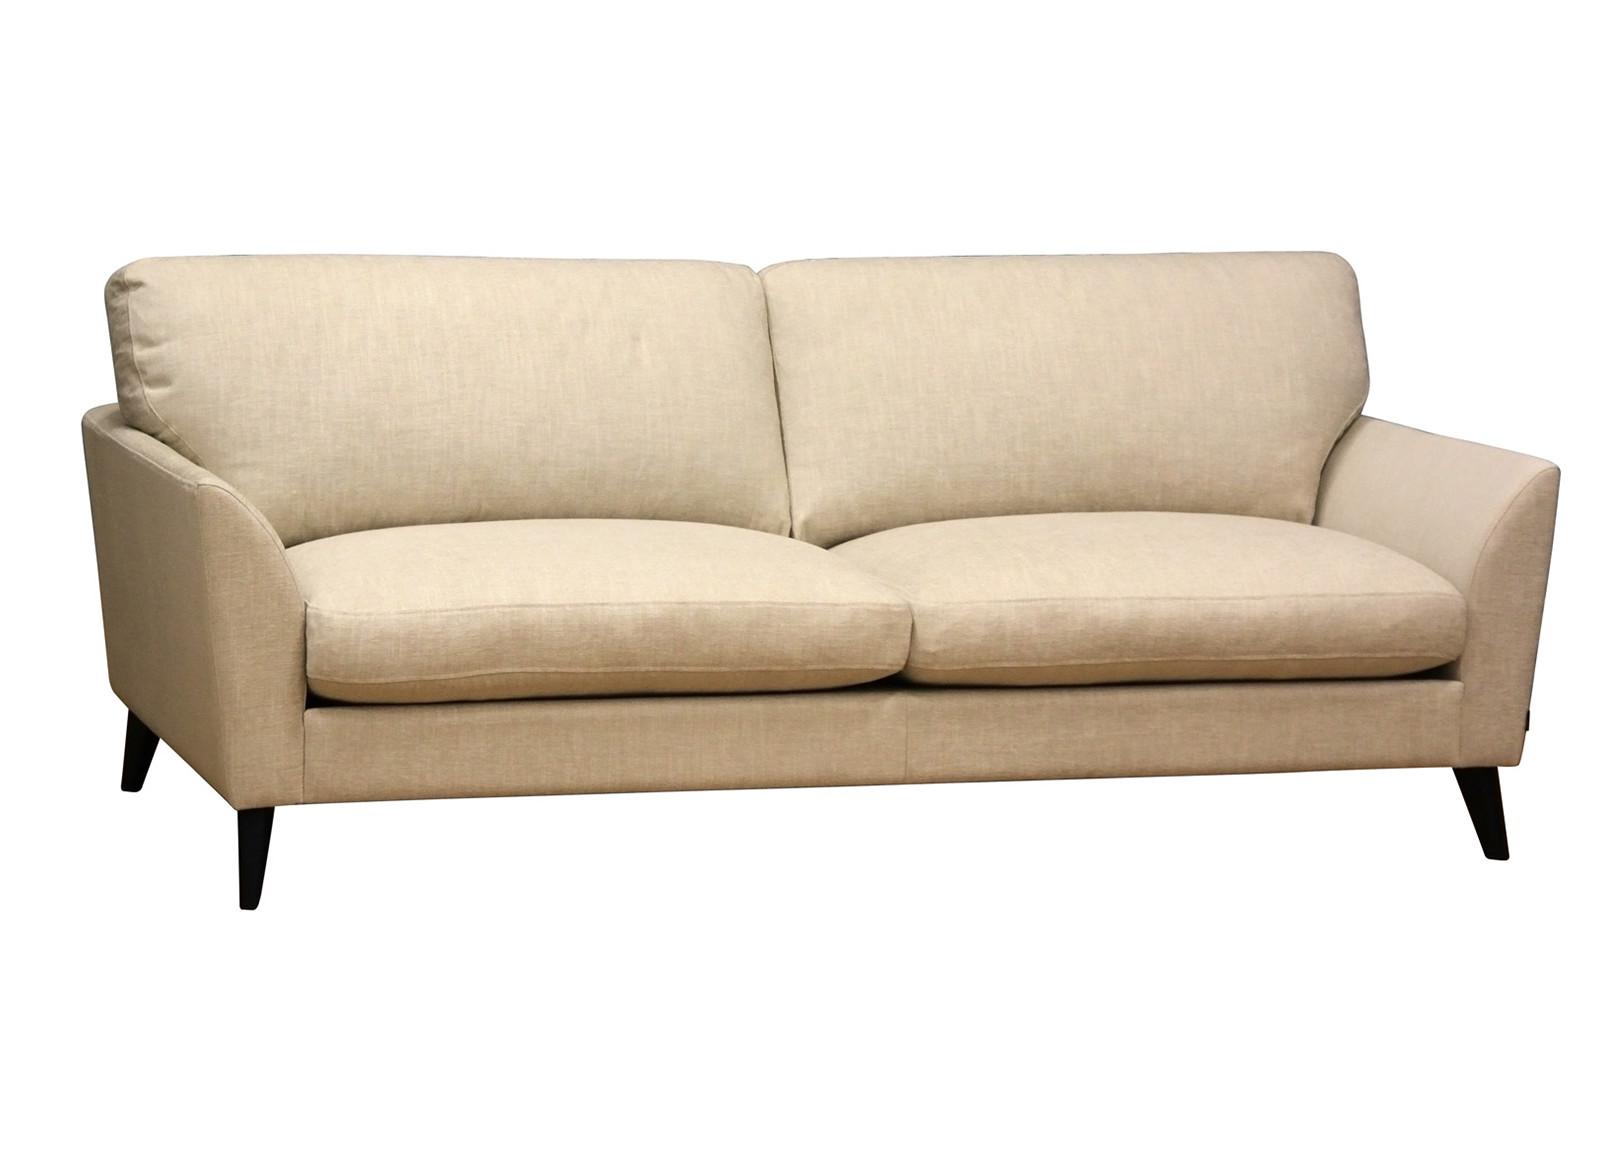 fly futon brilliant pdf plans woodworking plans flytying. Black Bedroom Furniture Sets. Home Design Ideas